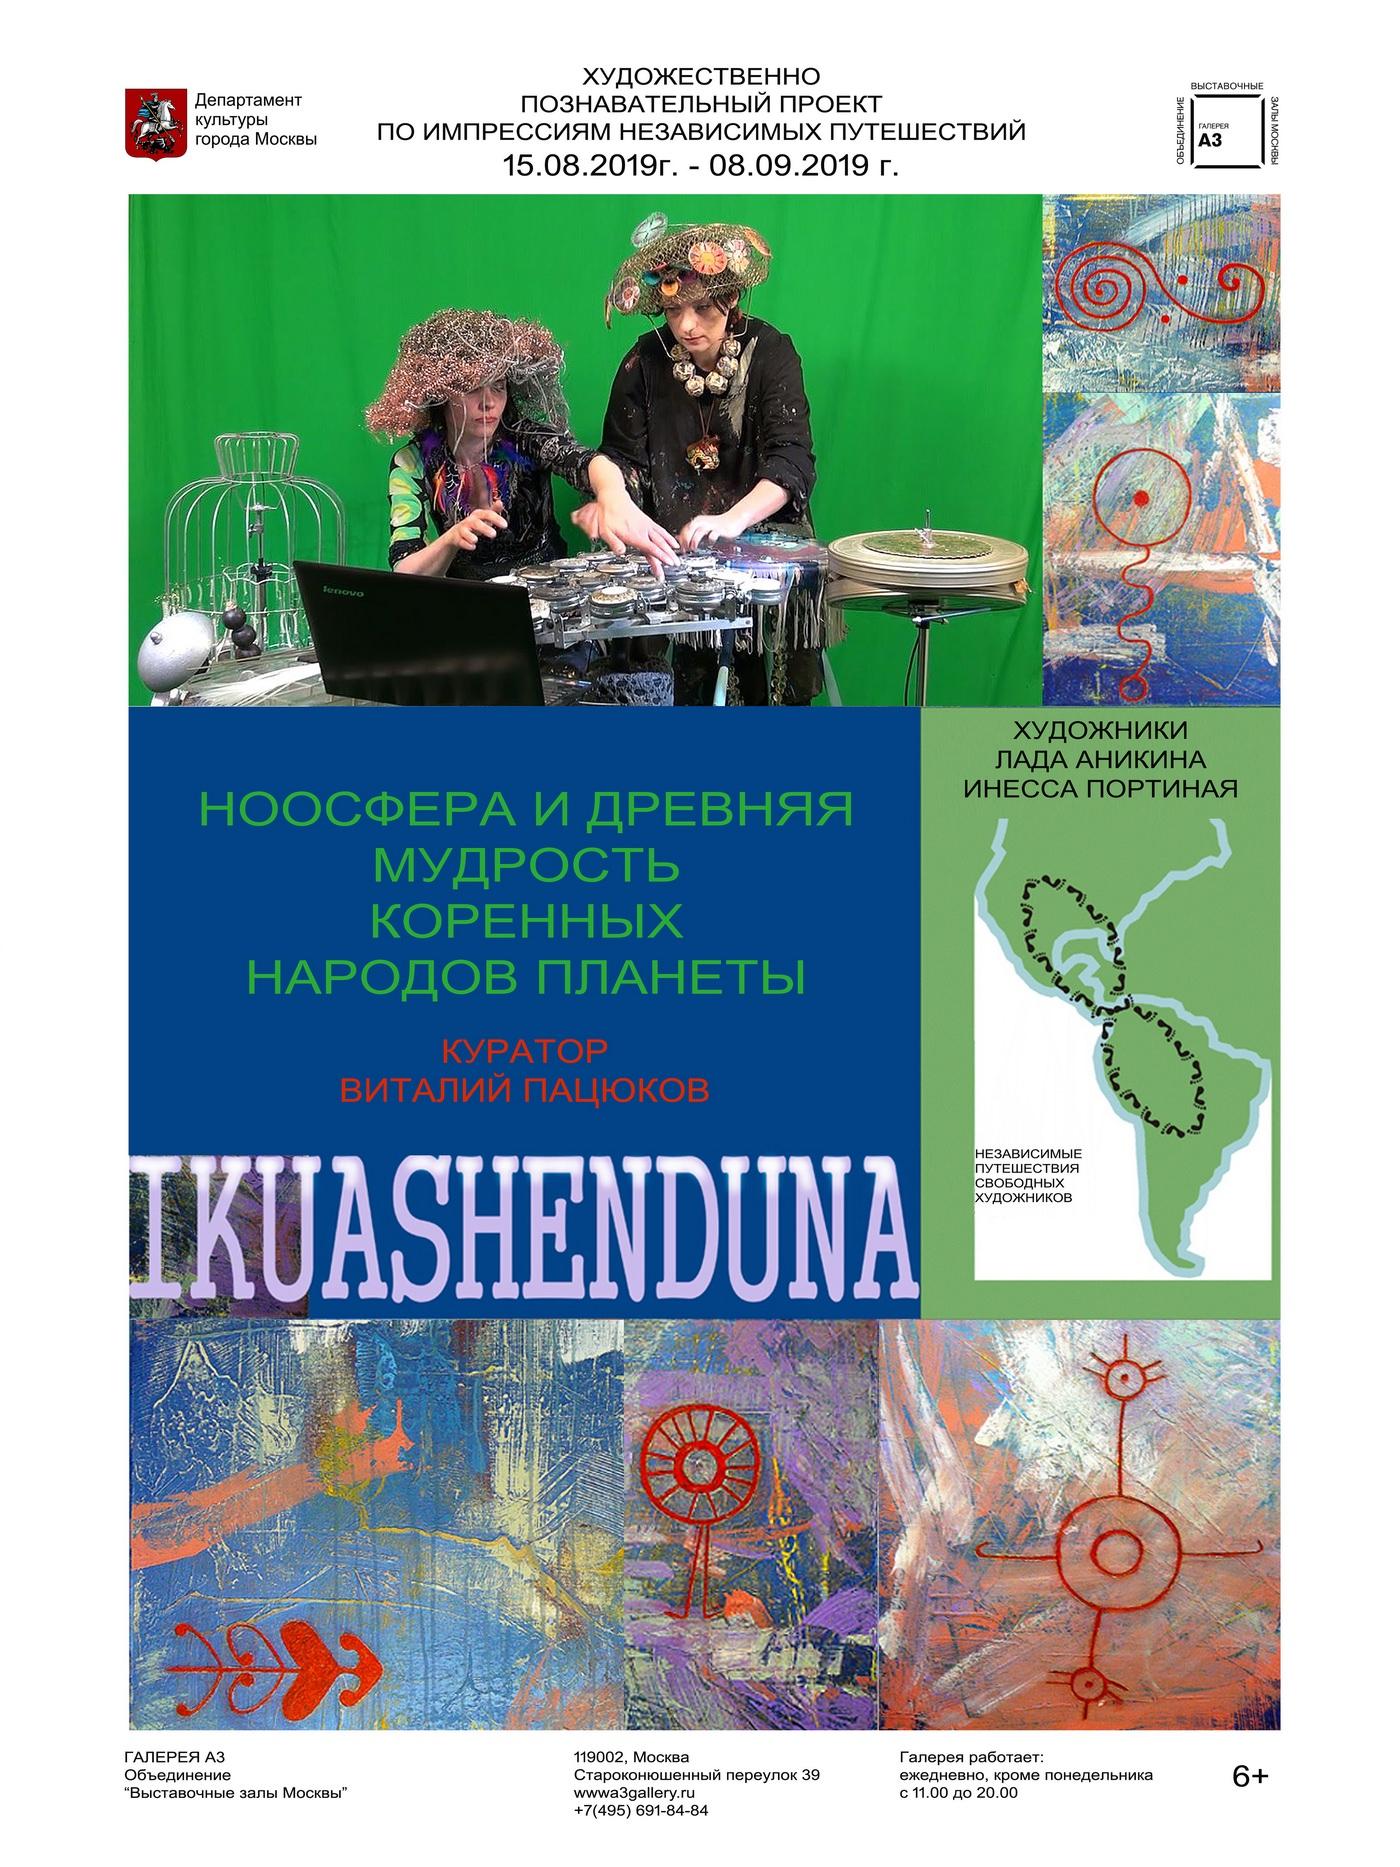 "Proyecto de Lada Anikina e Inessa Portina ""Ikvashenduna"" 6+"